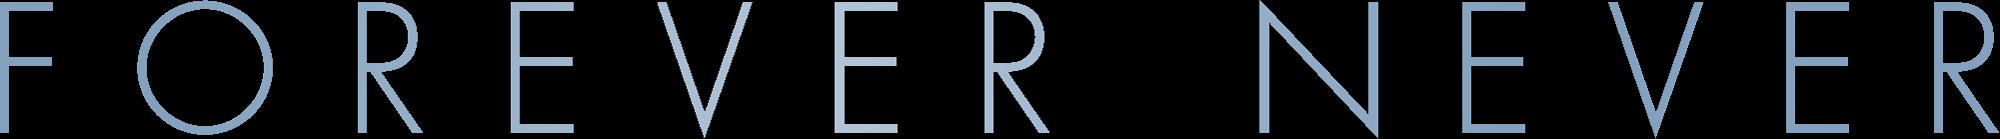 site-title-logo-4